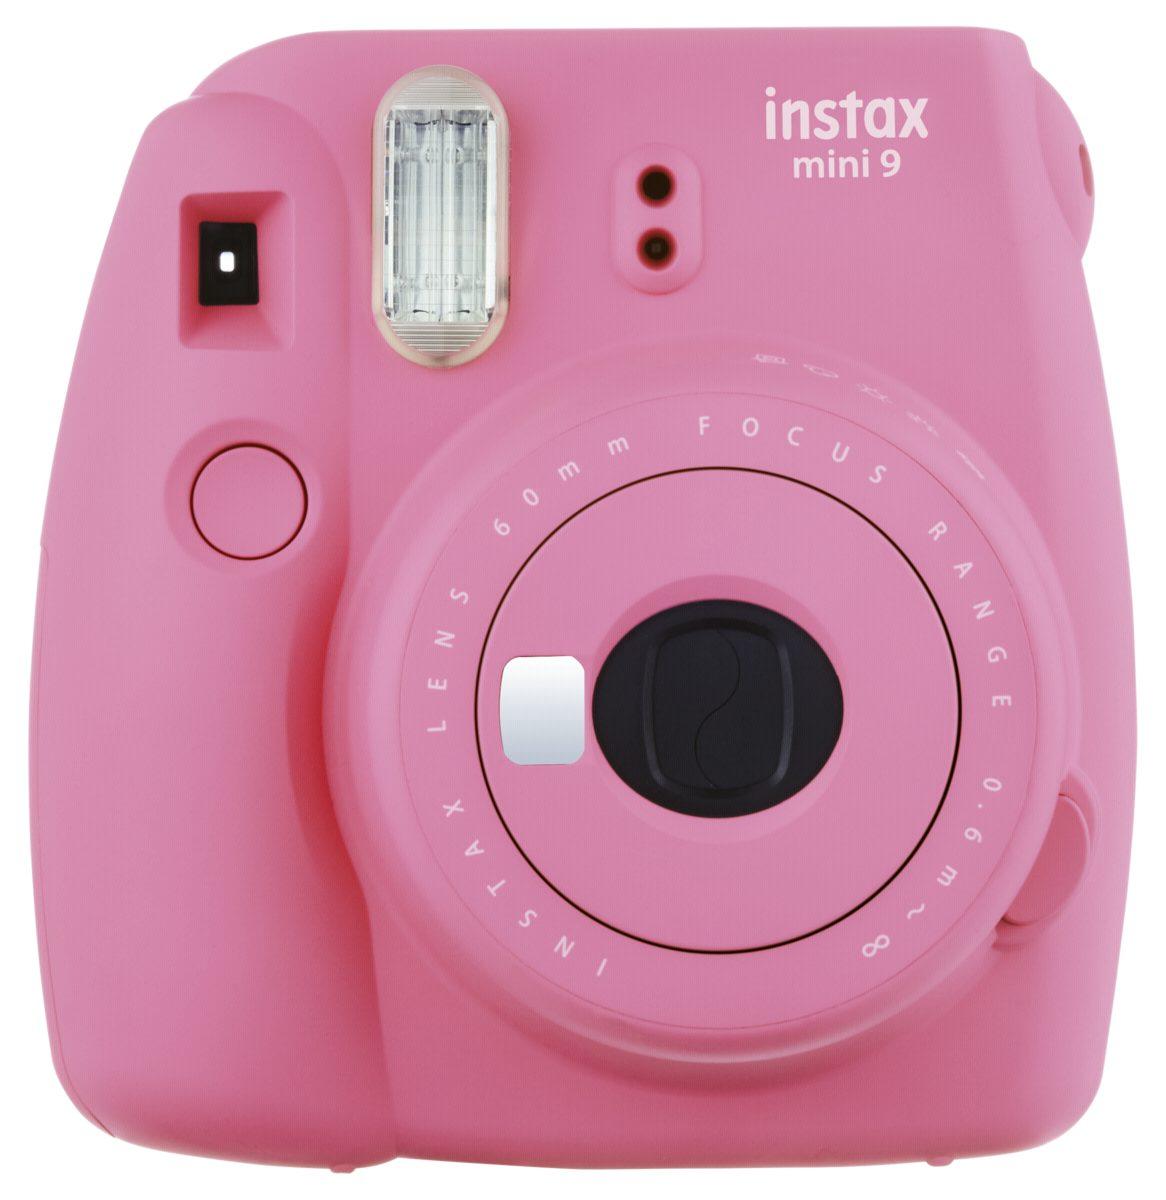 Fujifilm Sofortbildkamera »instax mini 9 set inkl. Film flamingo«